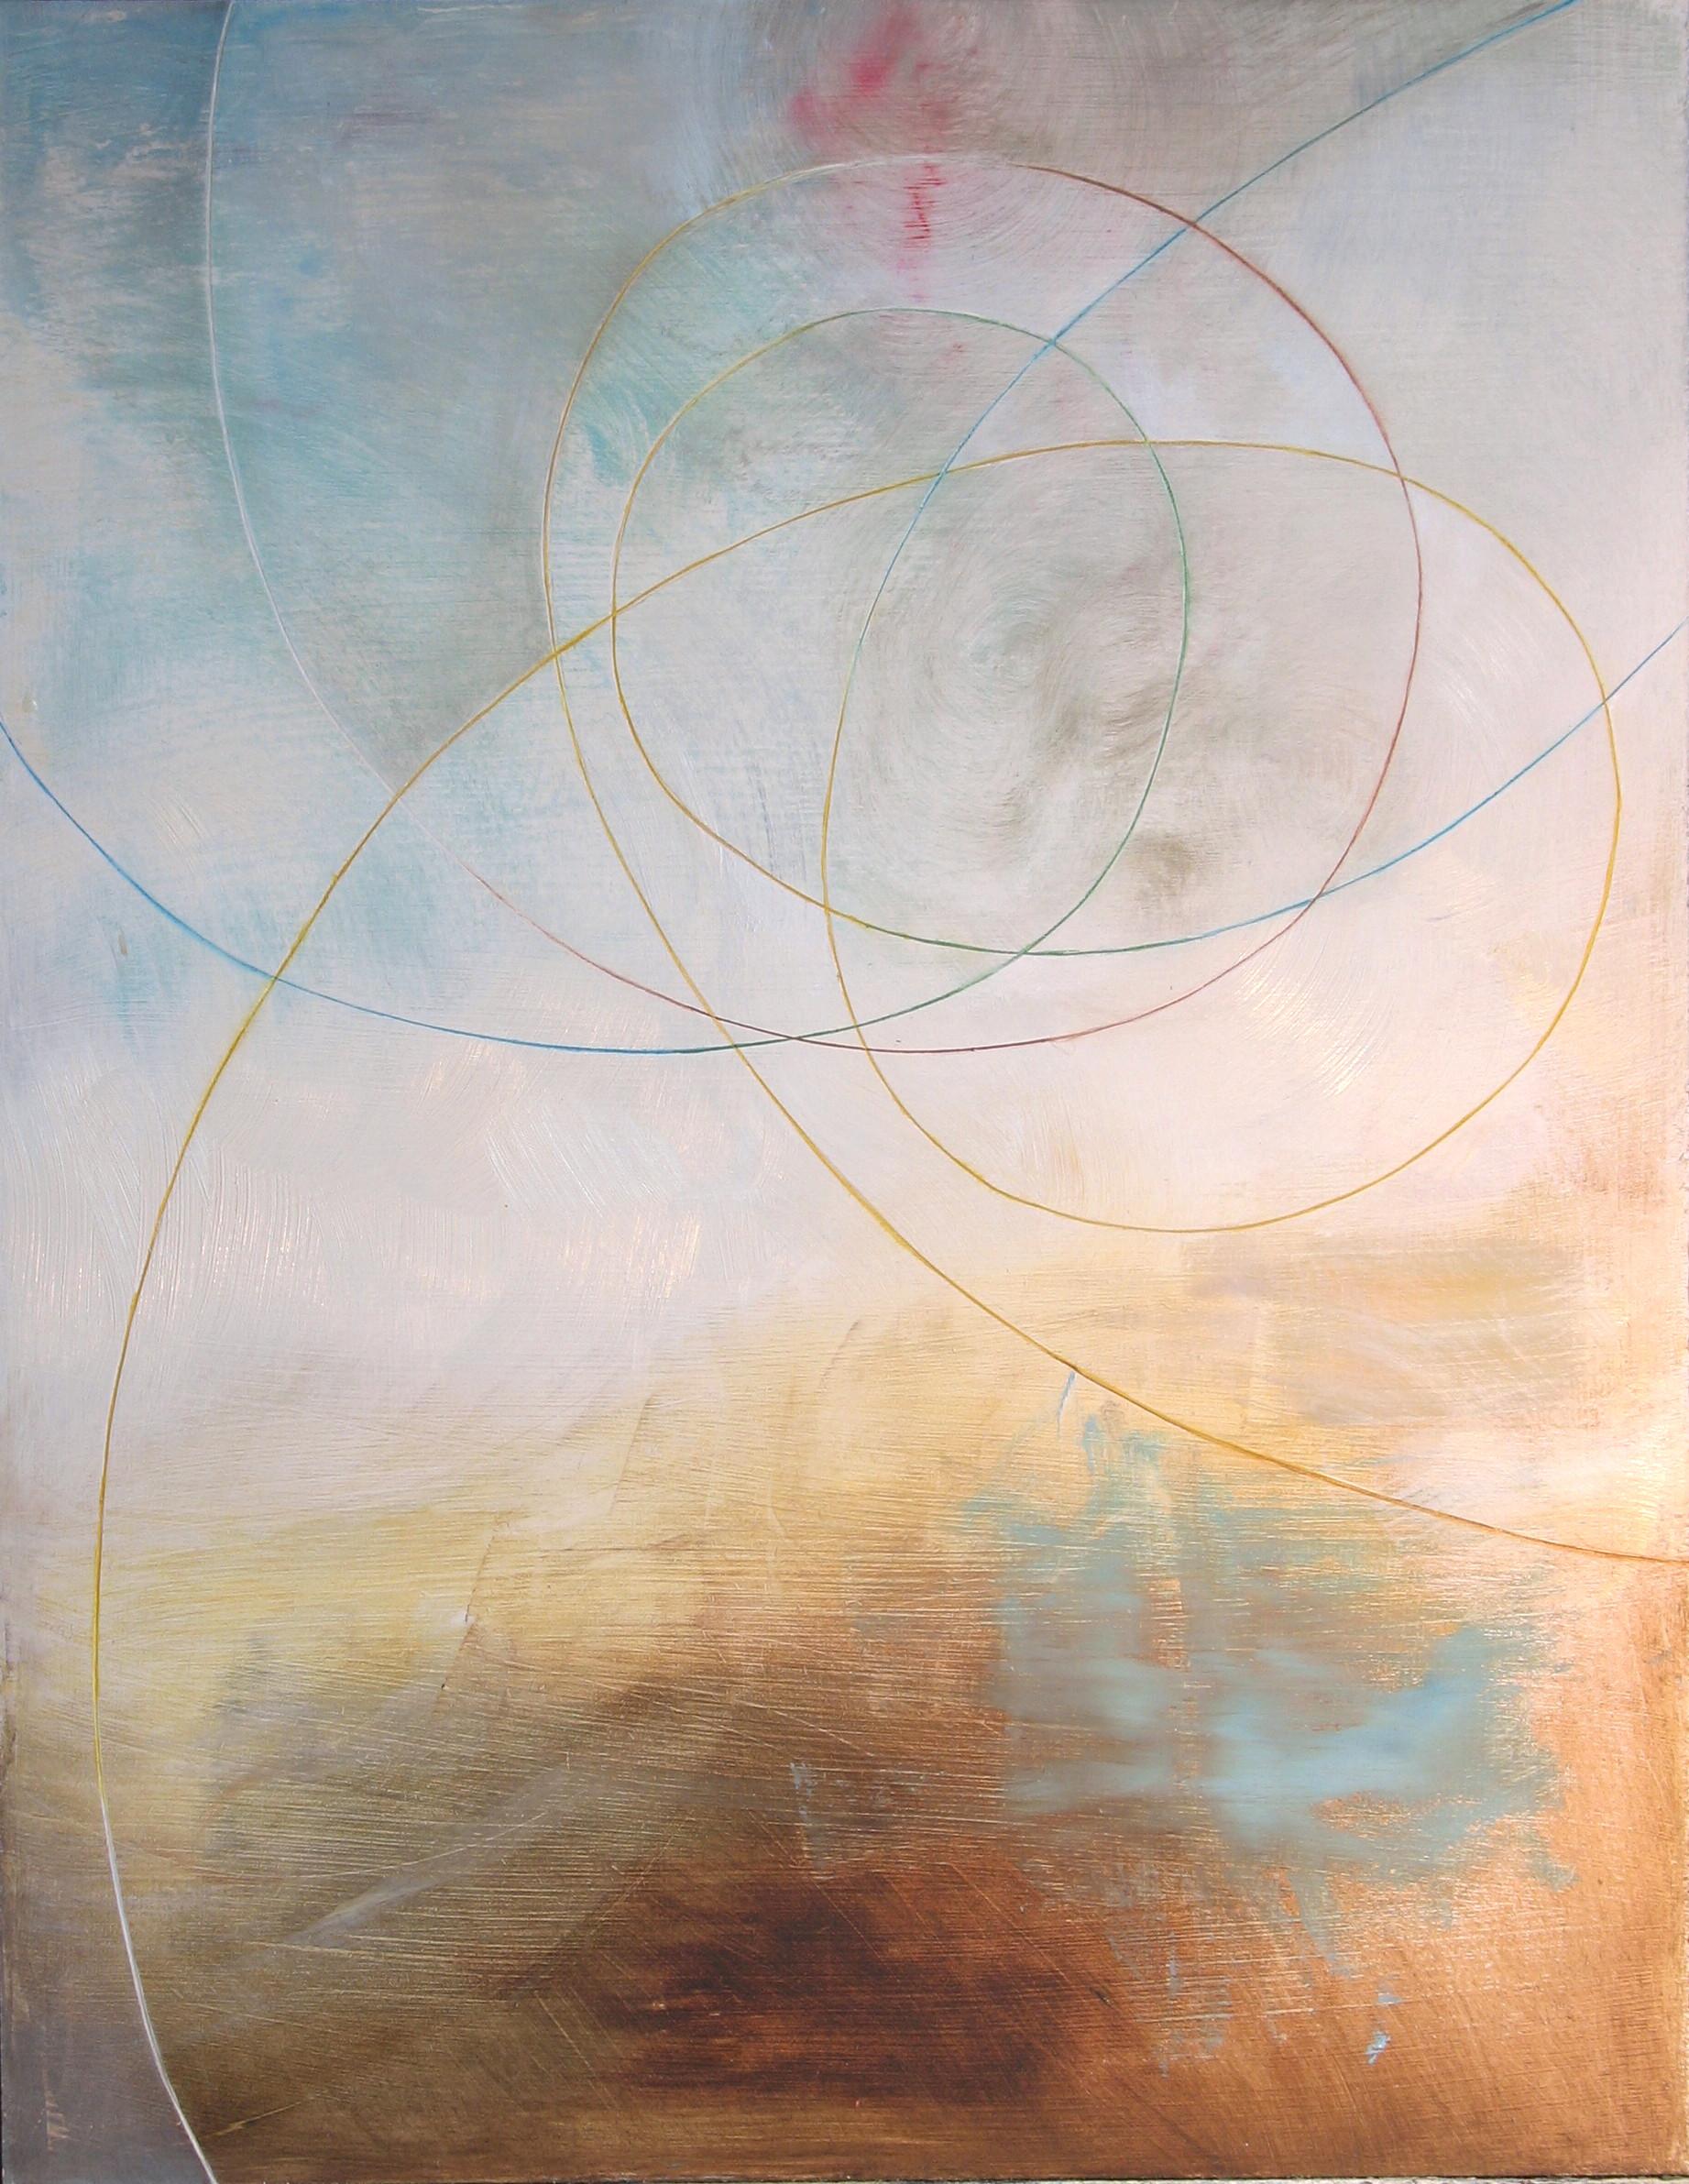 Up-draft, (c) Cathy Denford